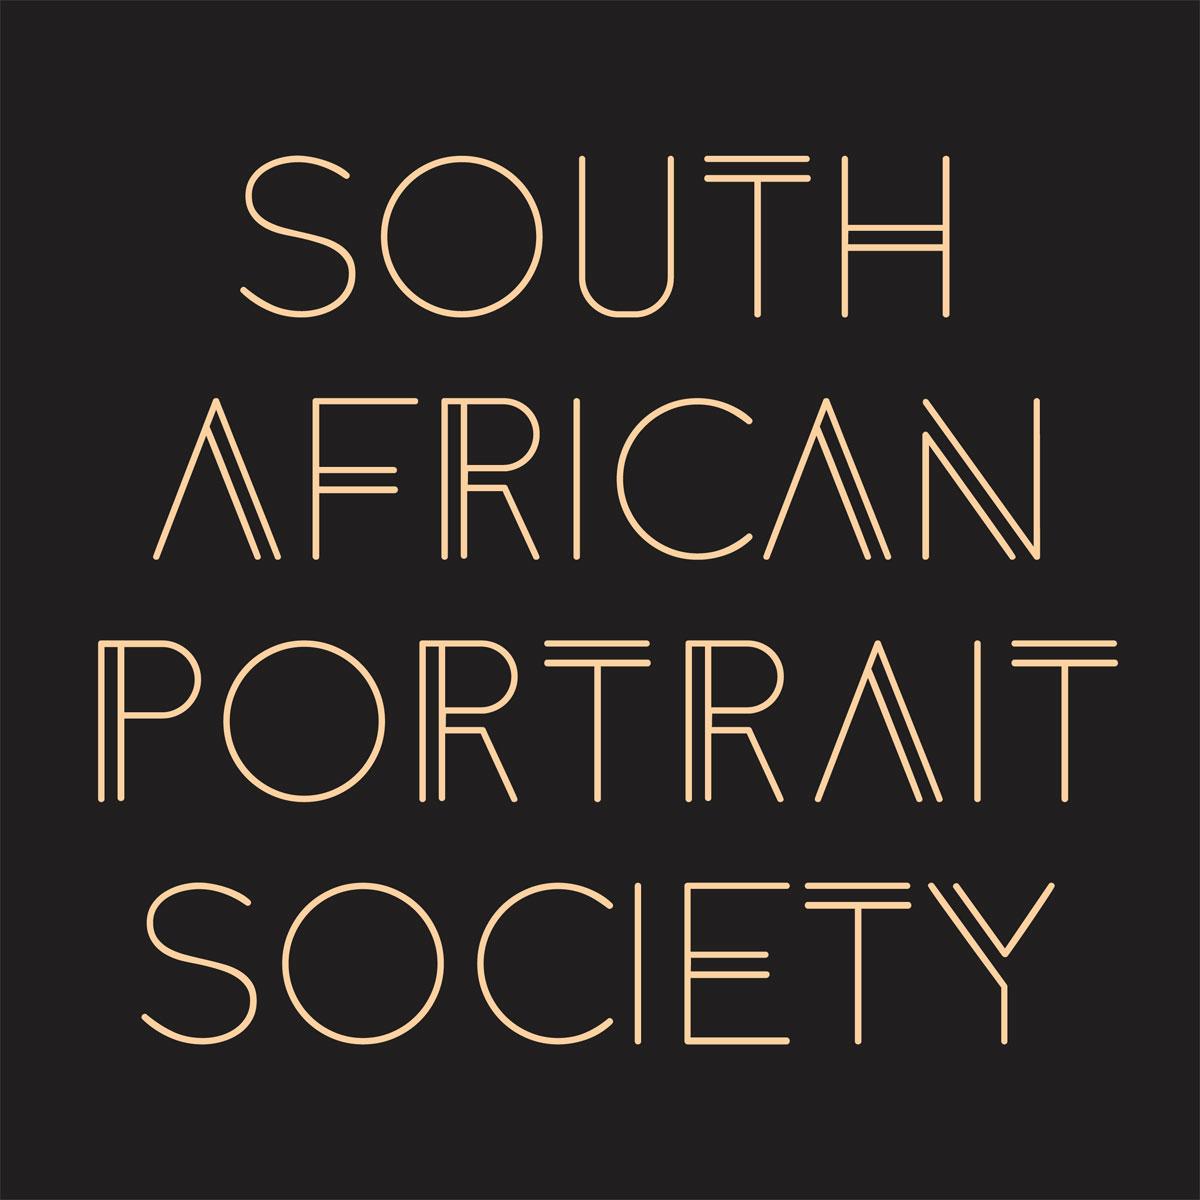 SA Portrait Society Logo